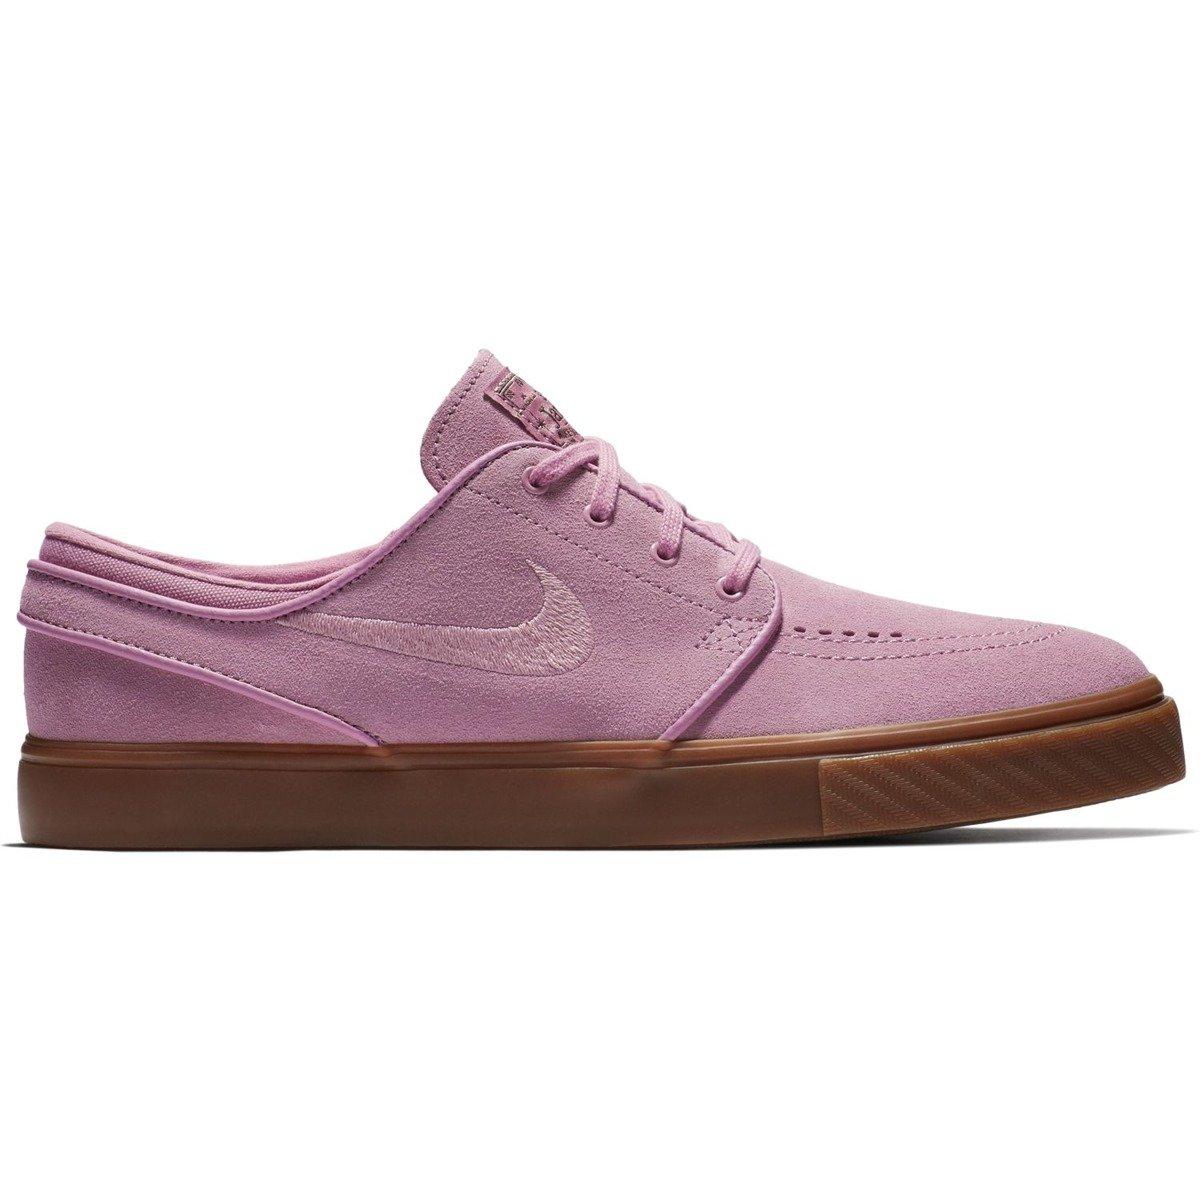 2128dbfcbbf1 shoes nike zoom stefan janoski elemental pink elemental pink-sequoia Click  to zoom ...